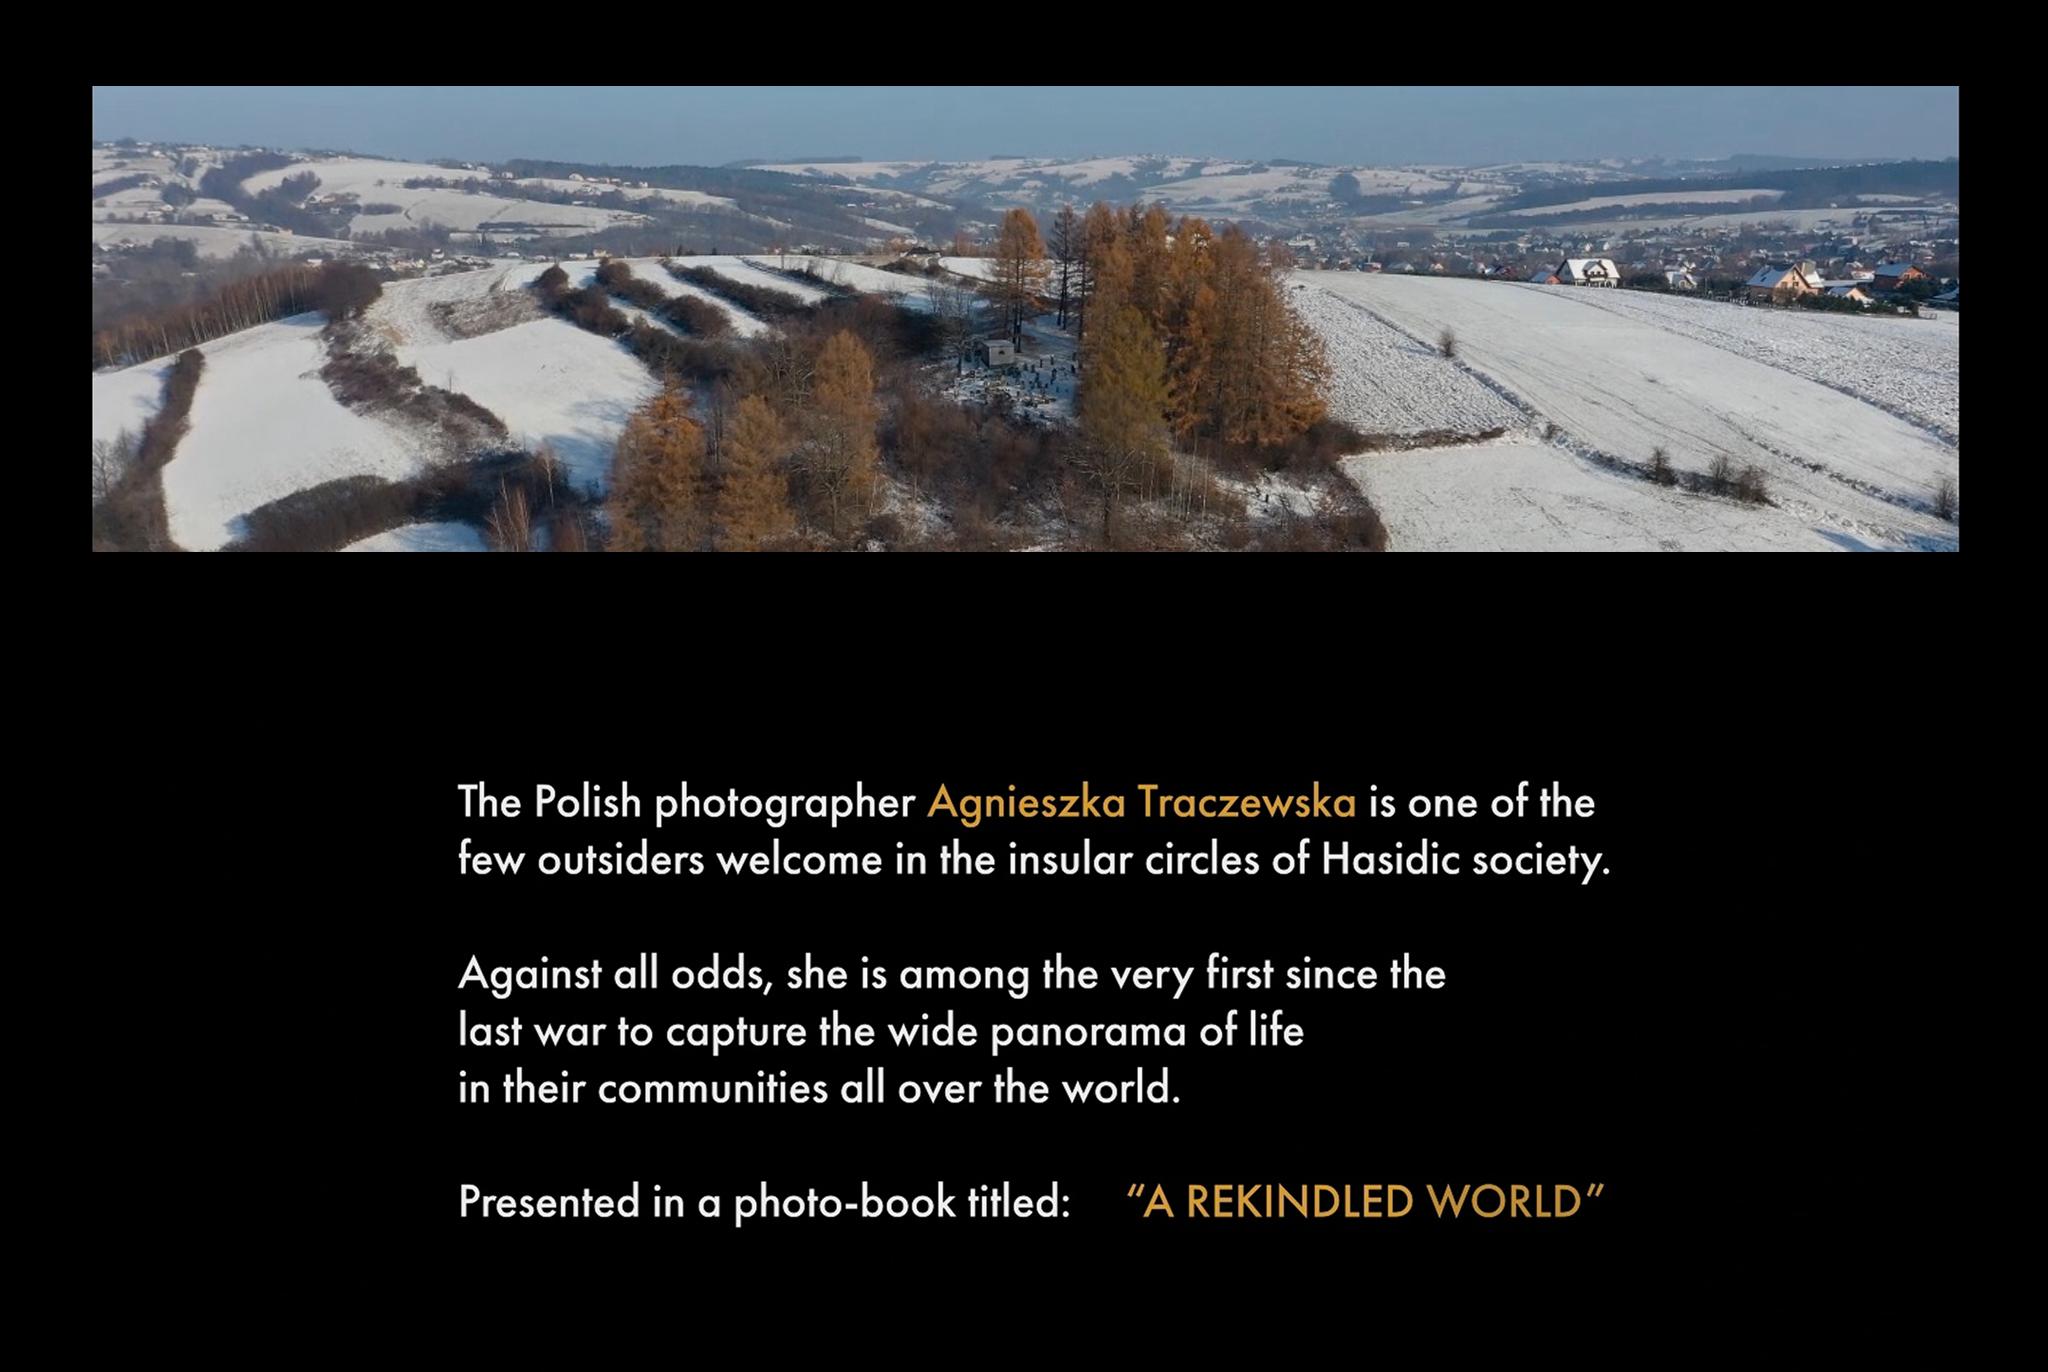 A-Rekindled-World-Promo-1280.mp4